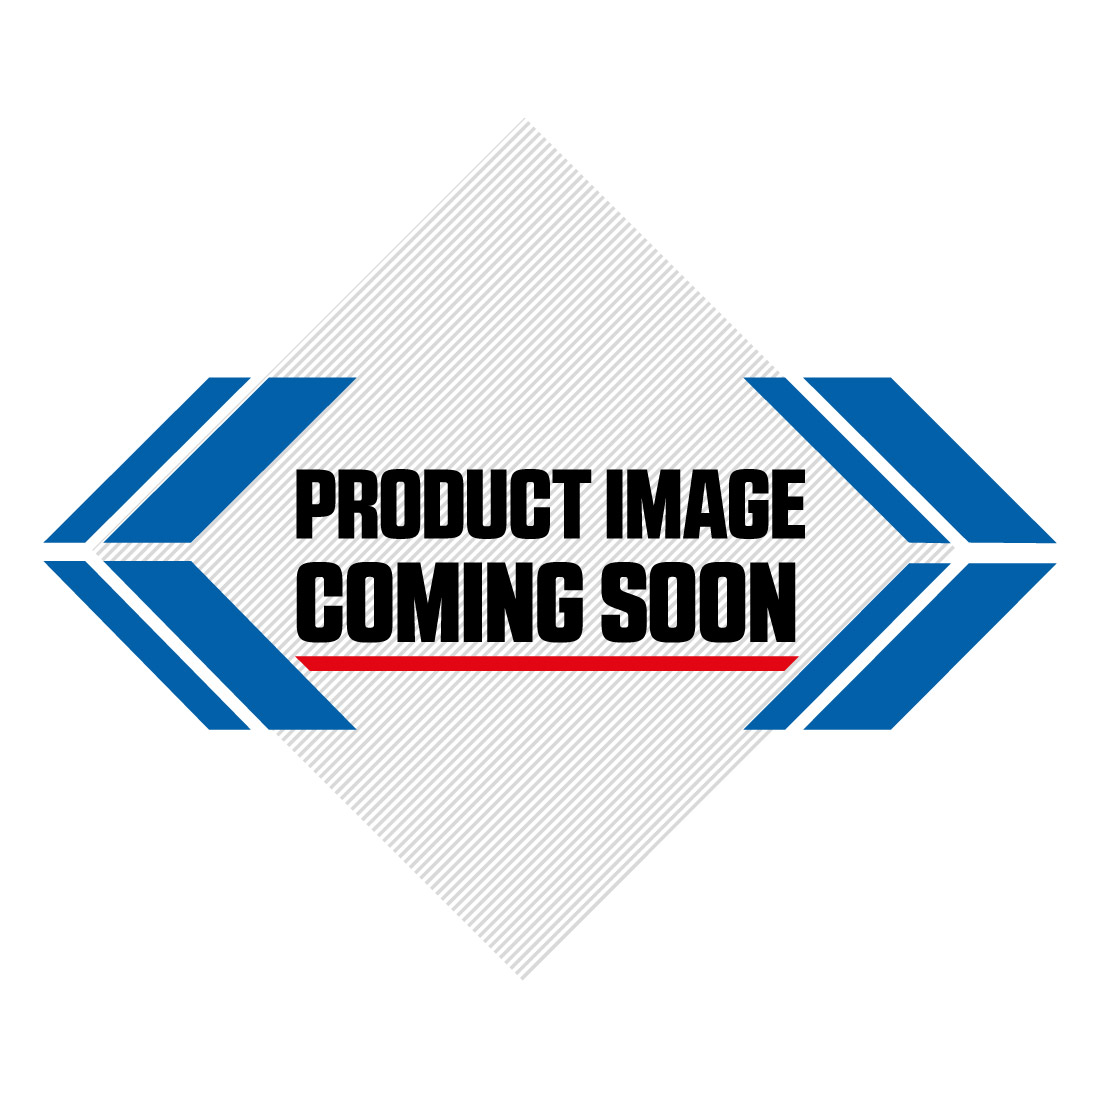 UFO Division Acqua Marina Motocross Kit Combo Image-1>